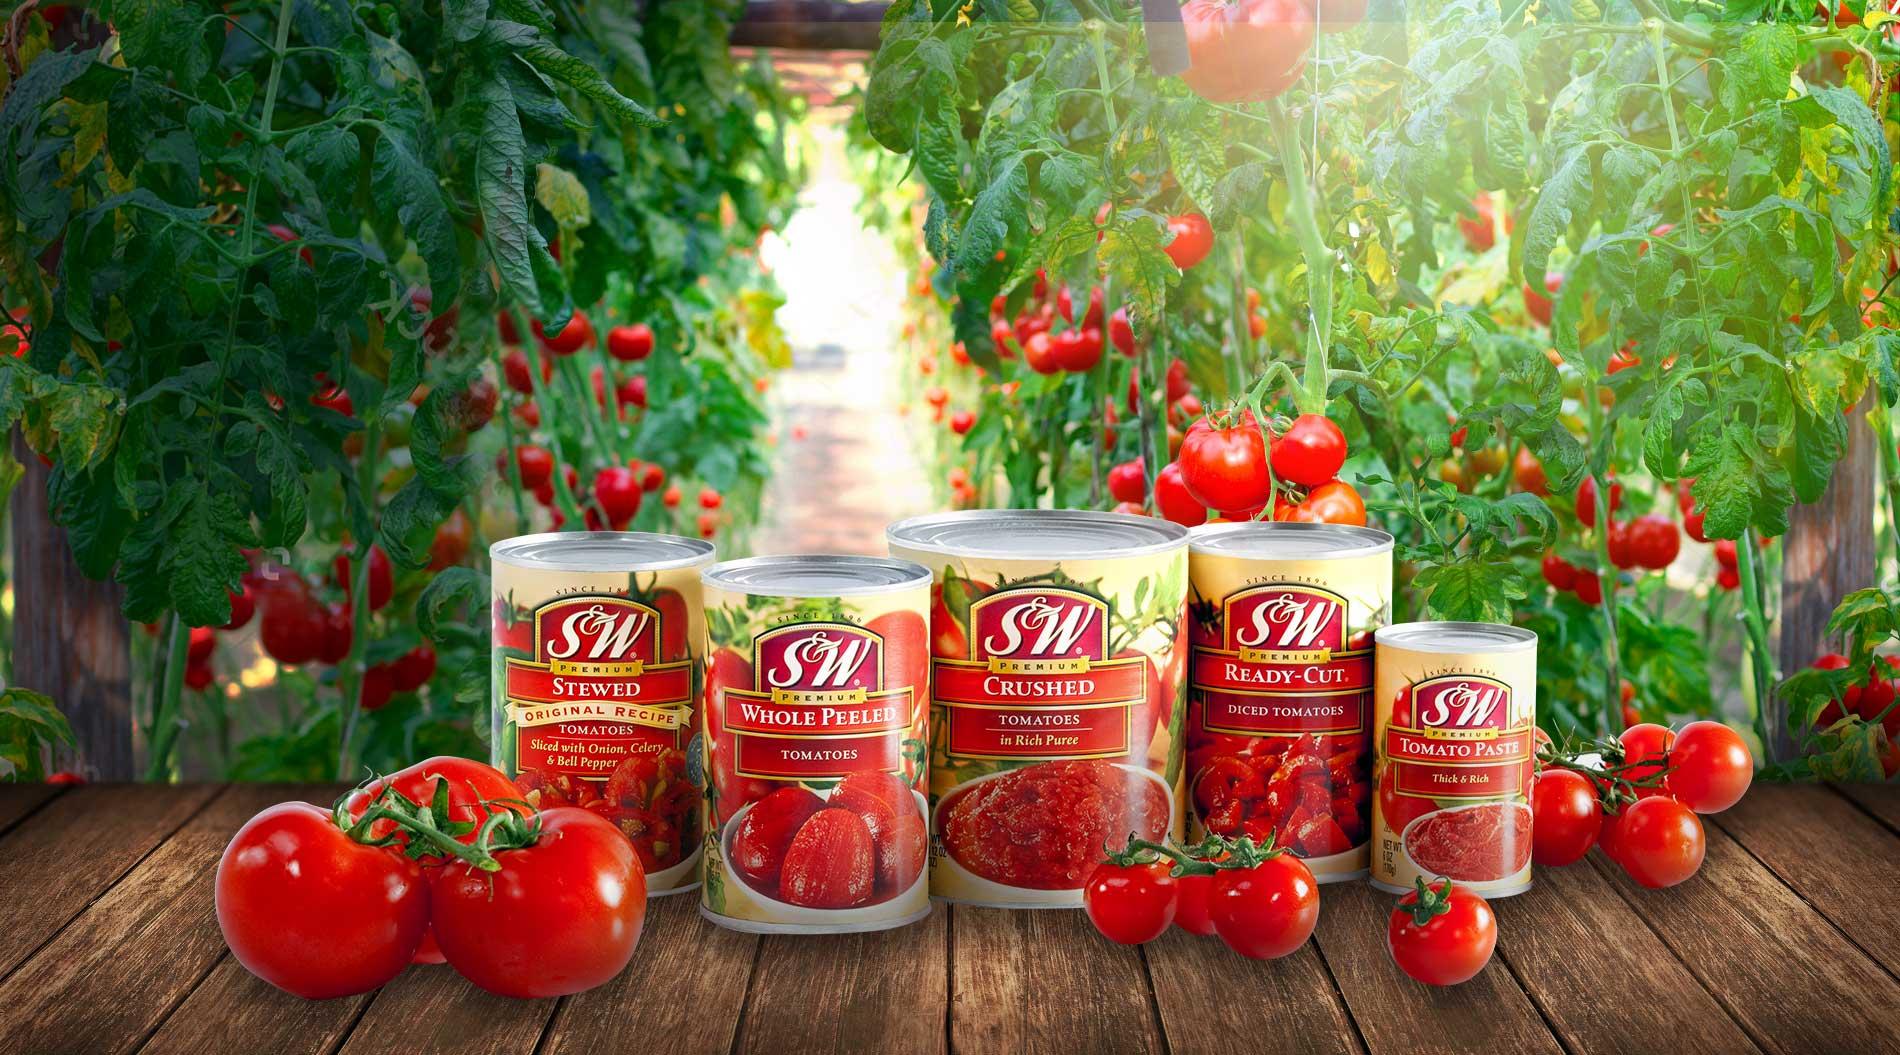 S&W Premium Foods - Canned Fruits, Vegetables, Snacks, Beverages